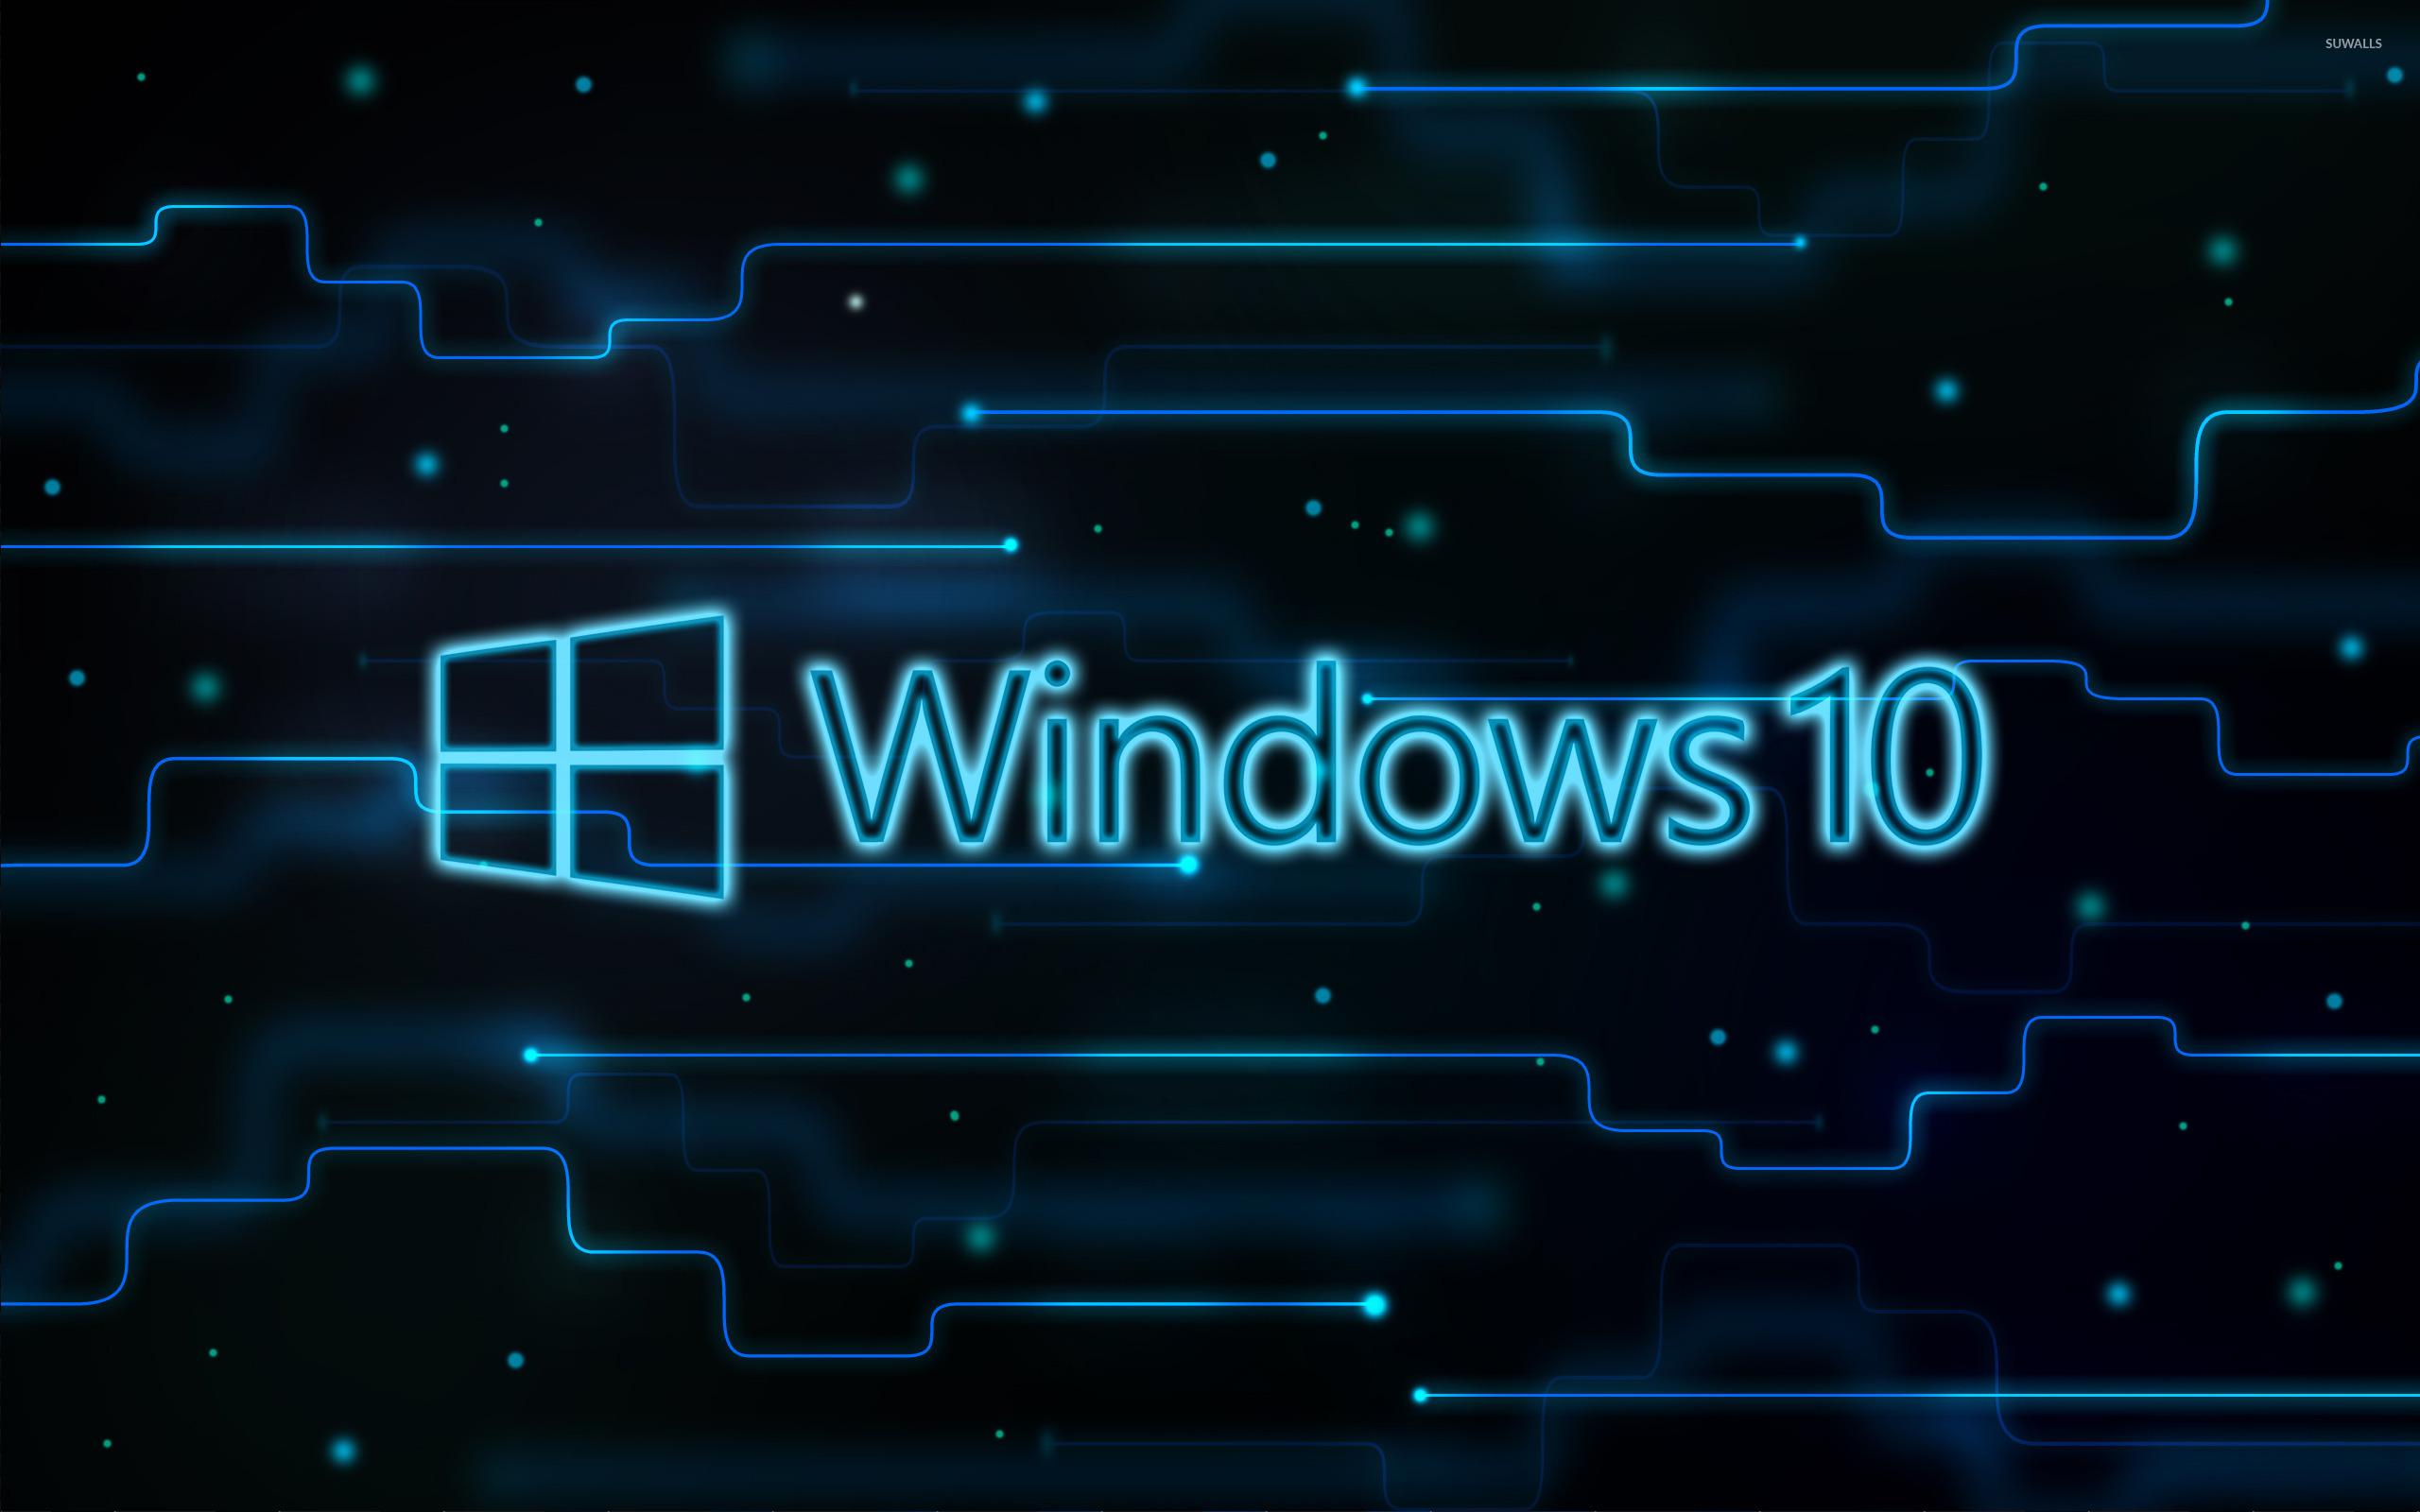 Windows 10 wallpaper - Computer wallpapers - #45281